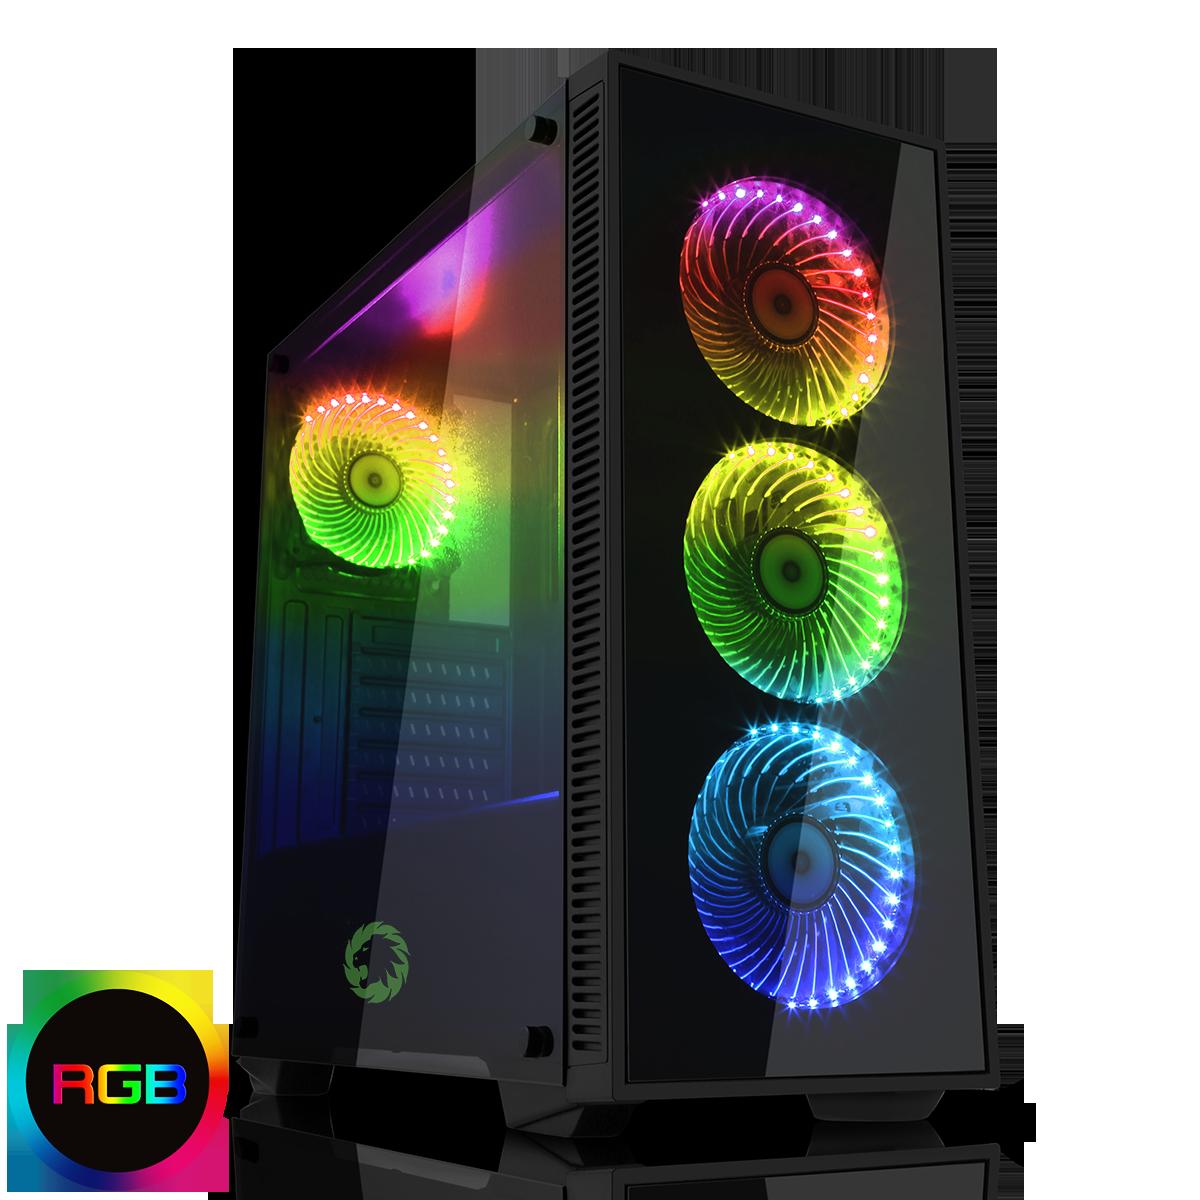 GAMEMAX Draco Black RGB 4 x 12cm RGB Fans Tempered Glass Side & Front Panels